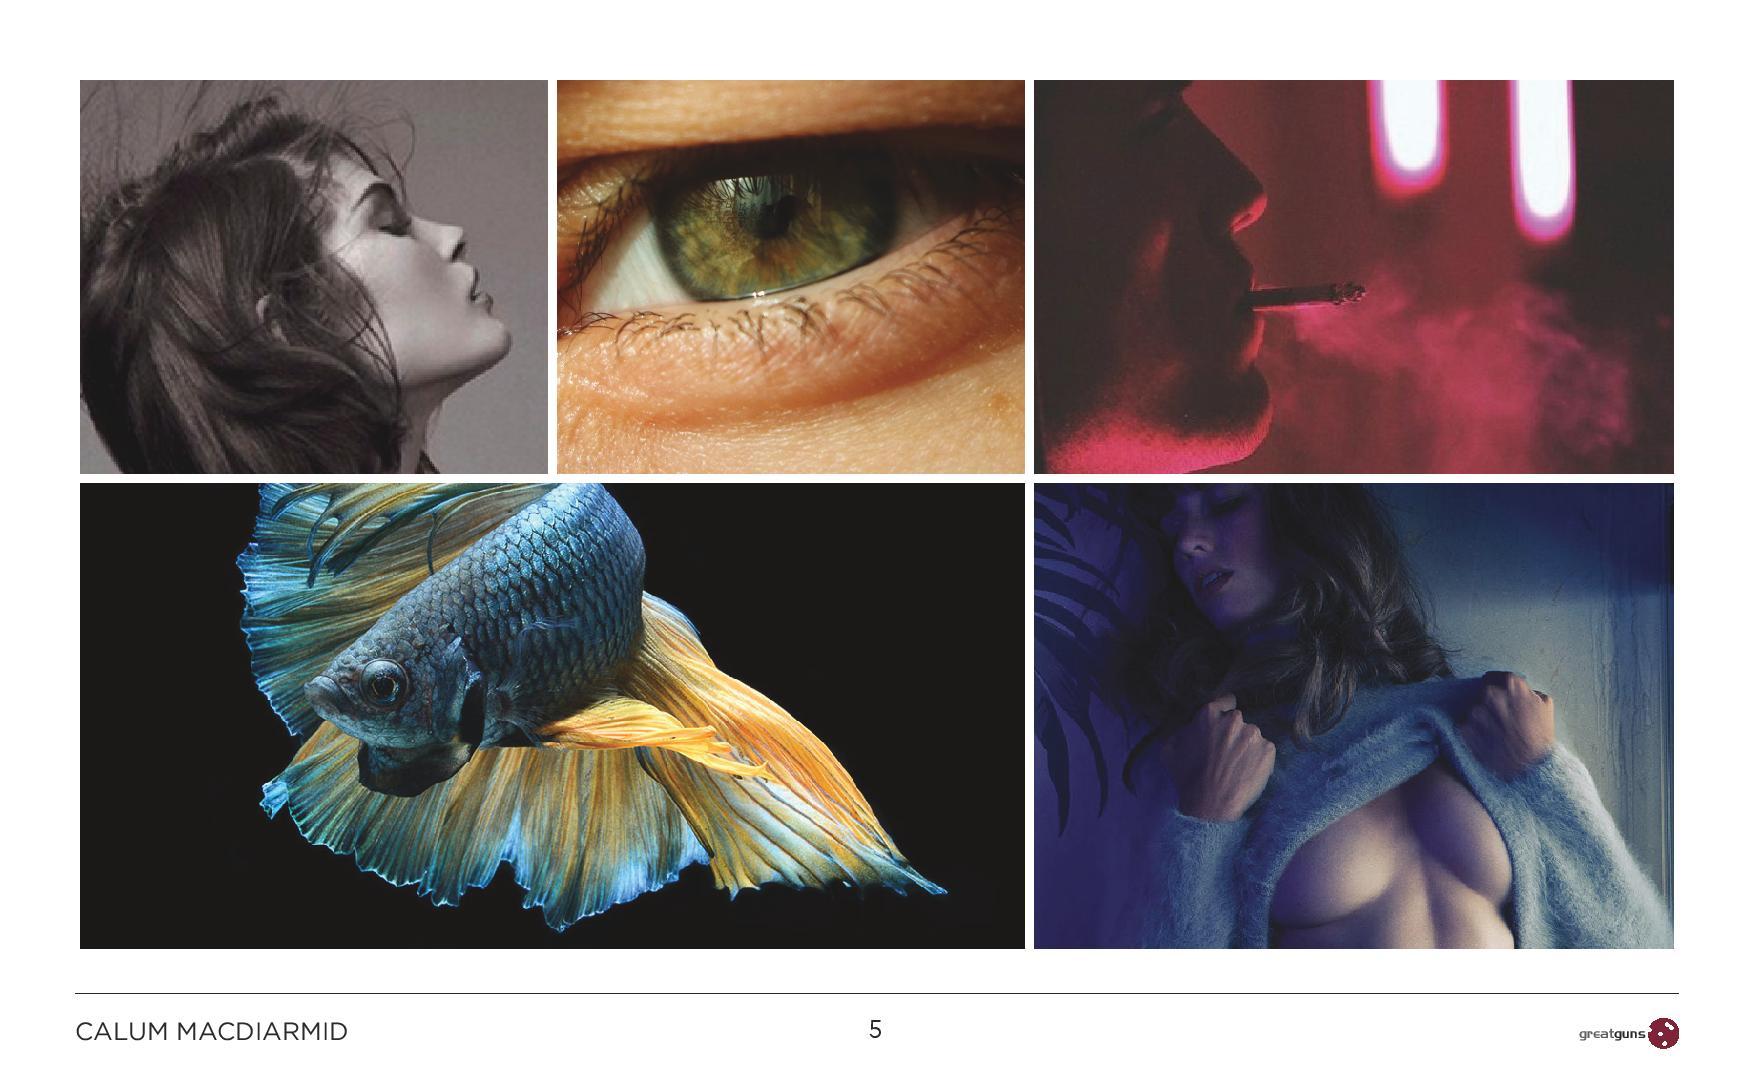 Sirens-page-005.jpg